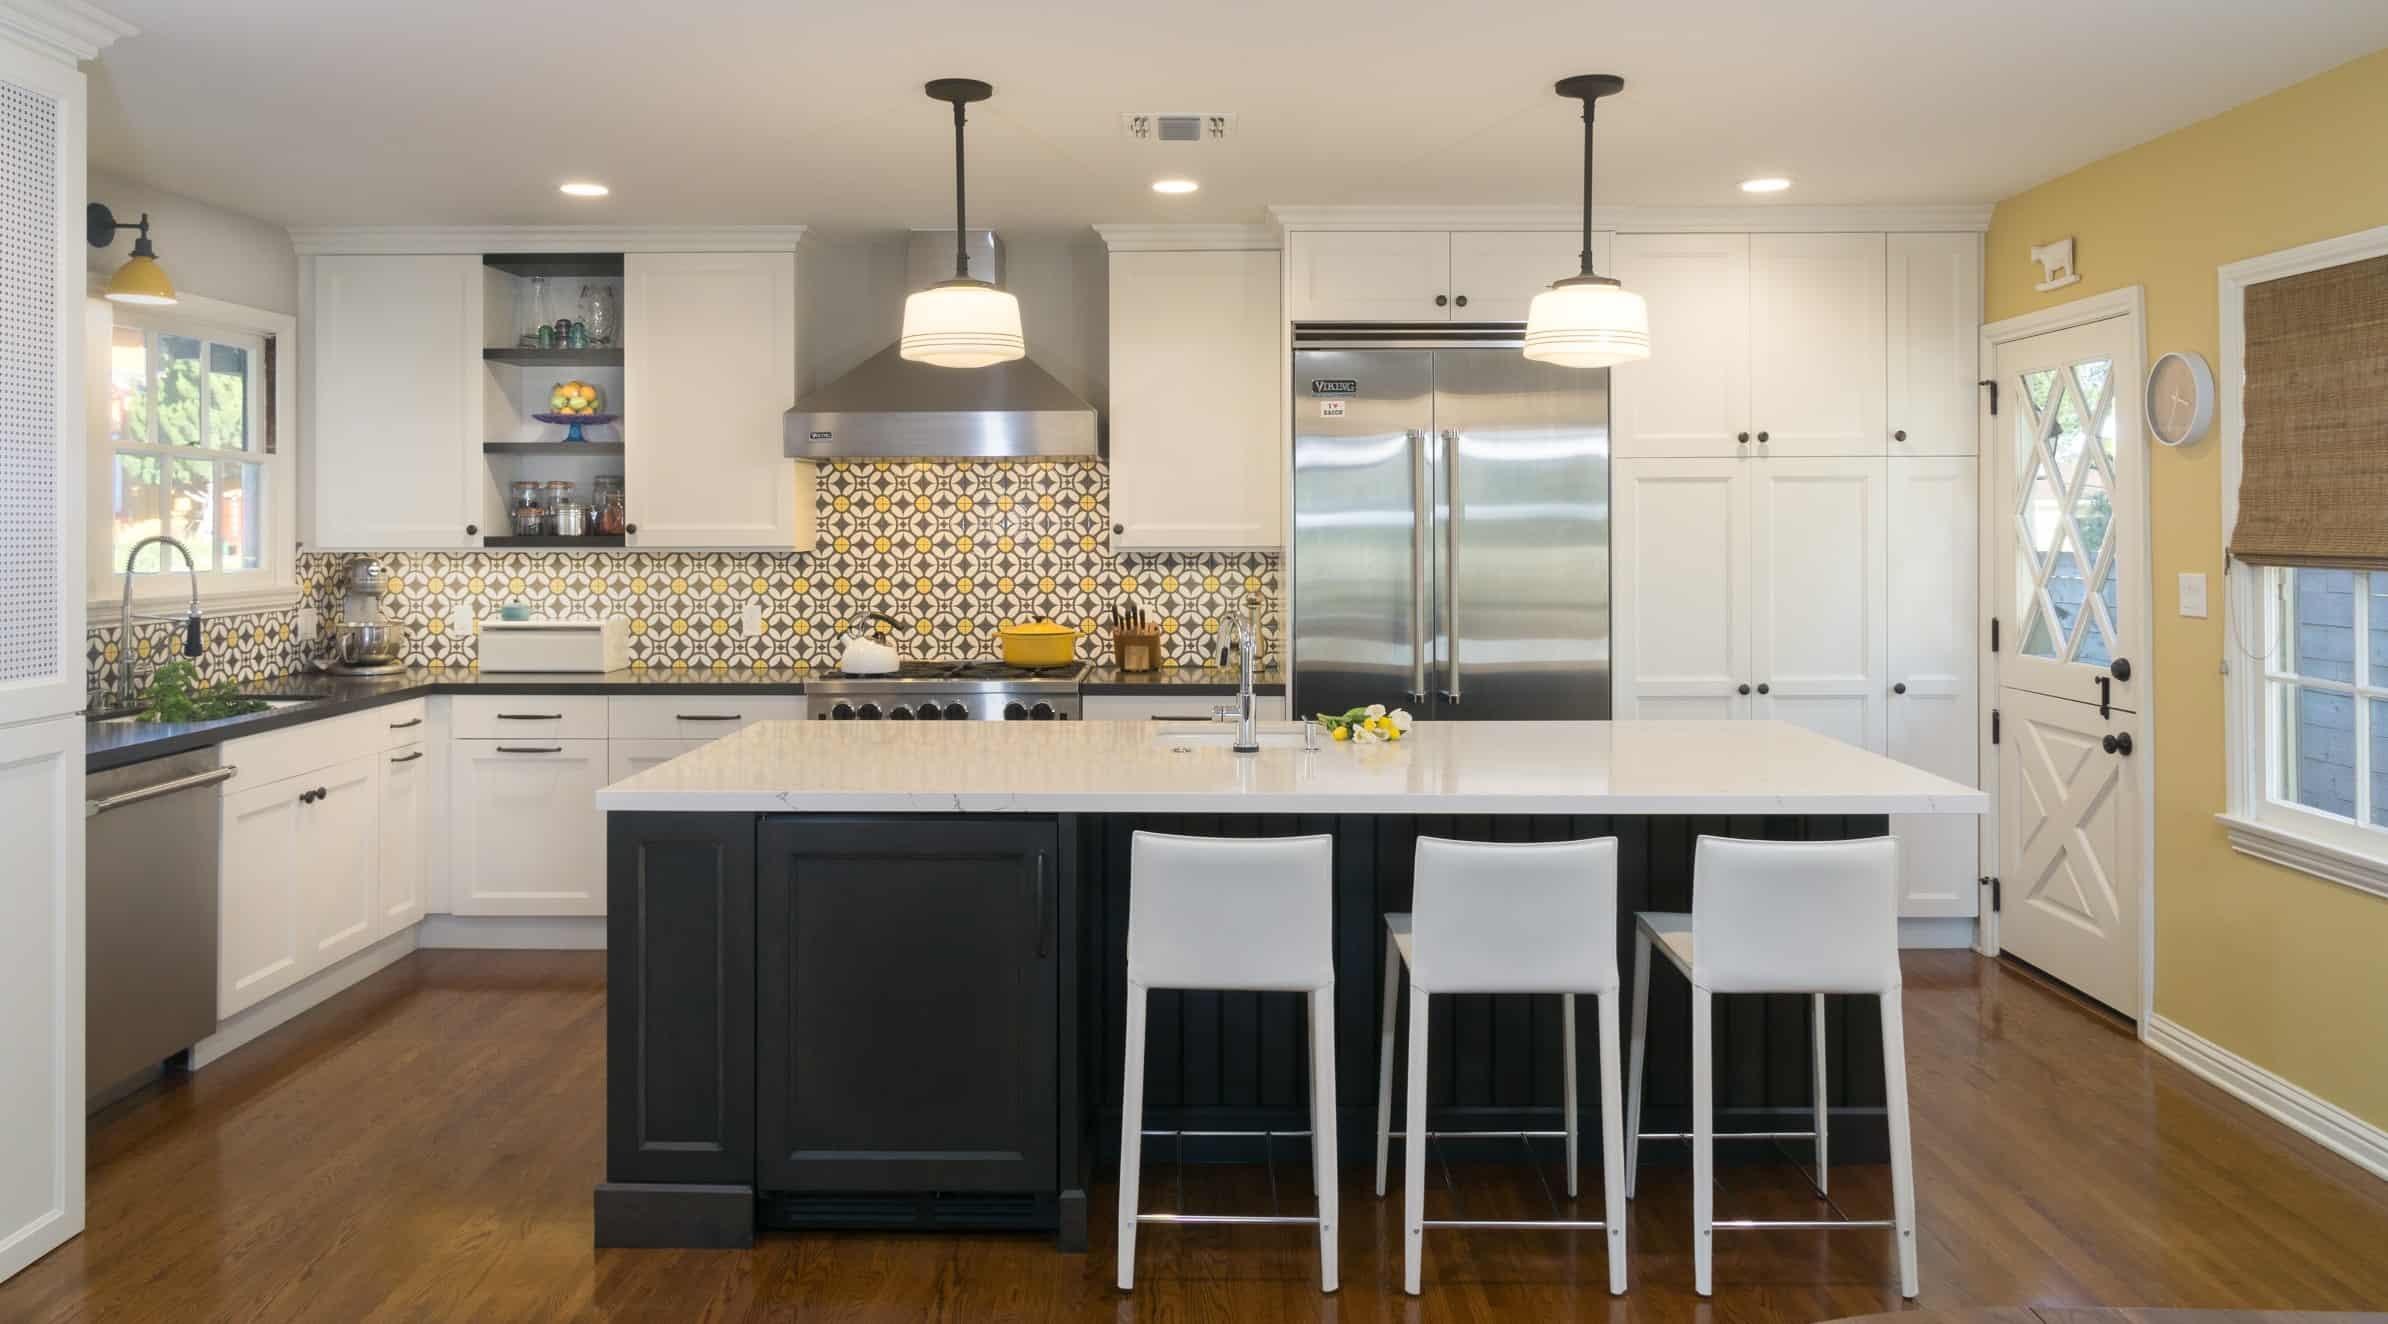 About Cabinets | Merit Kitchens Ltd.